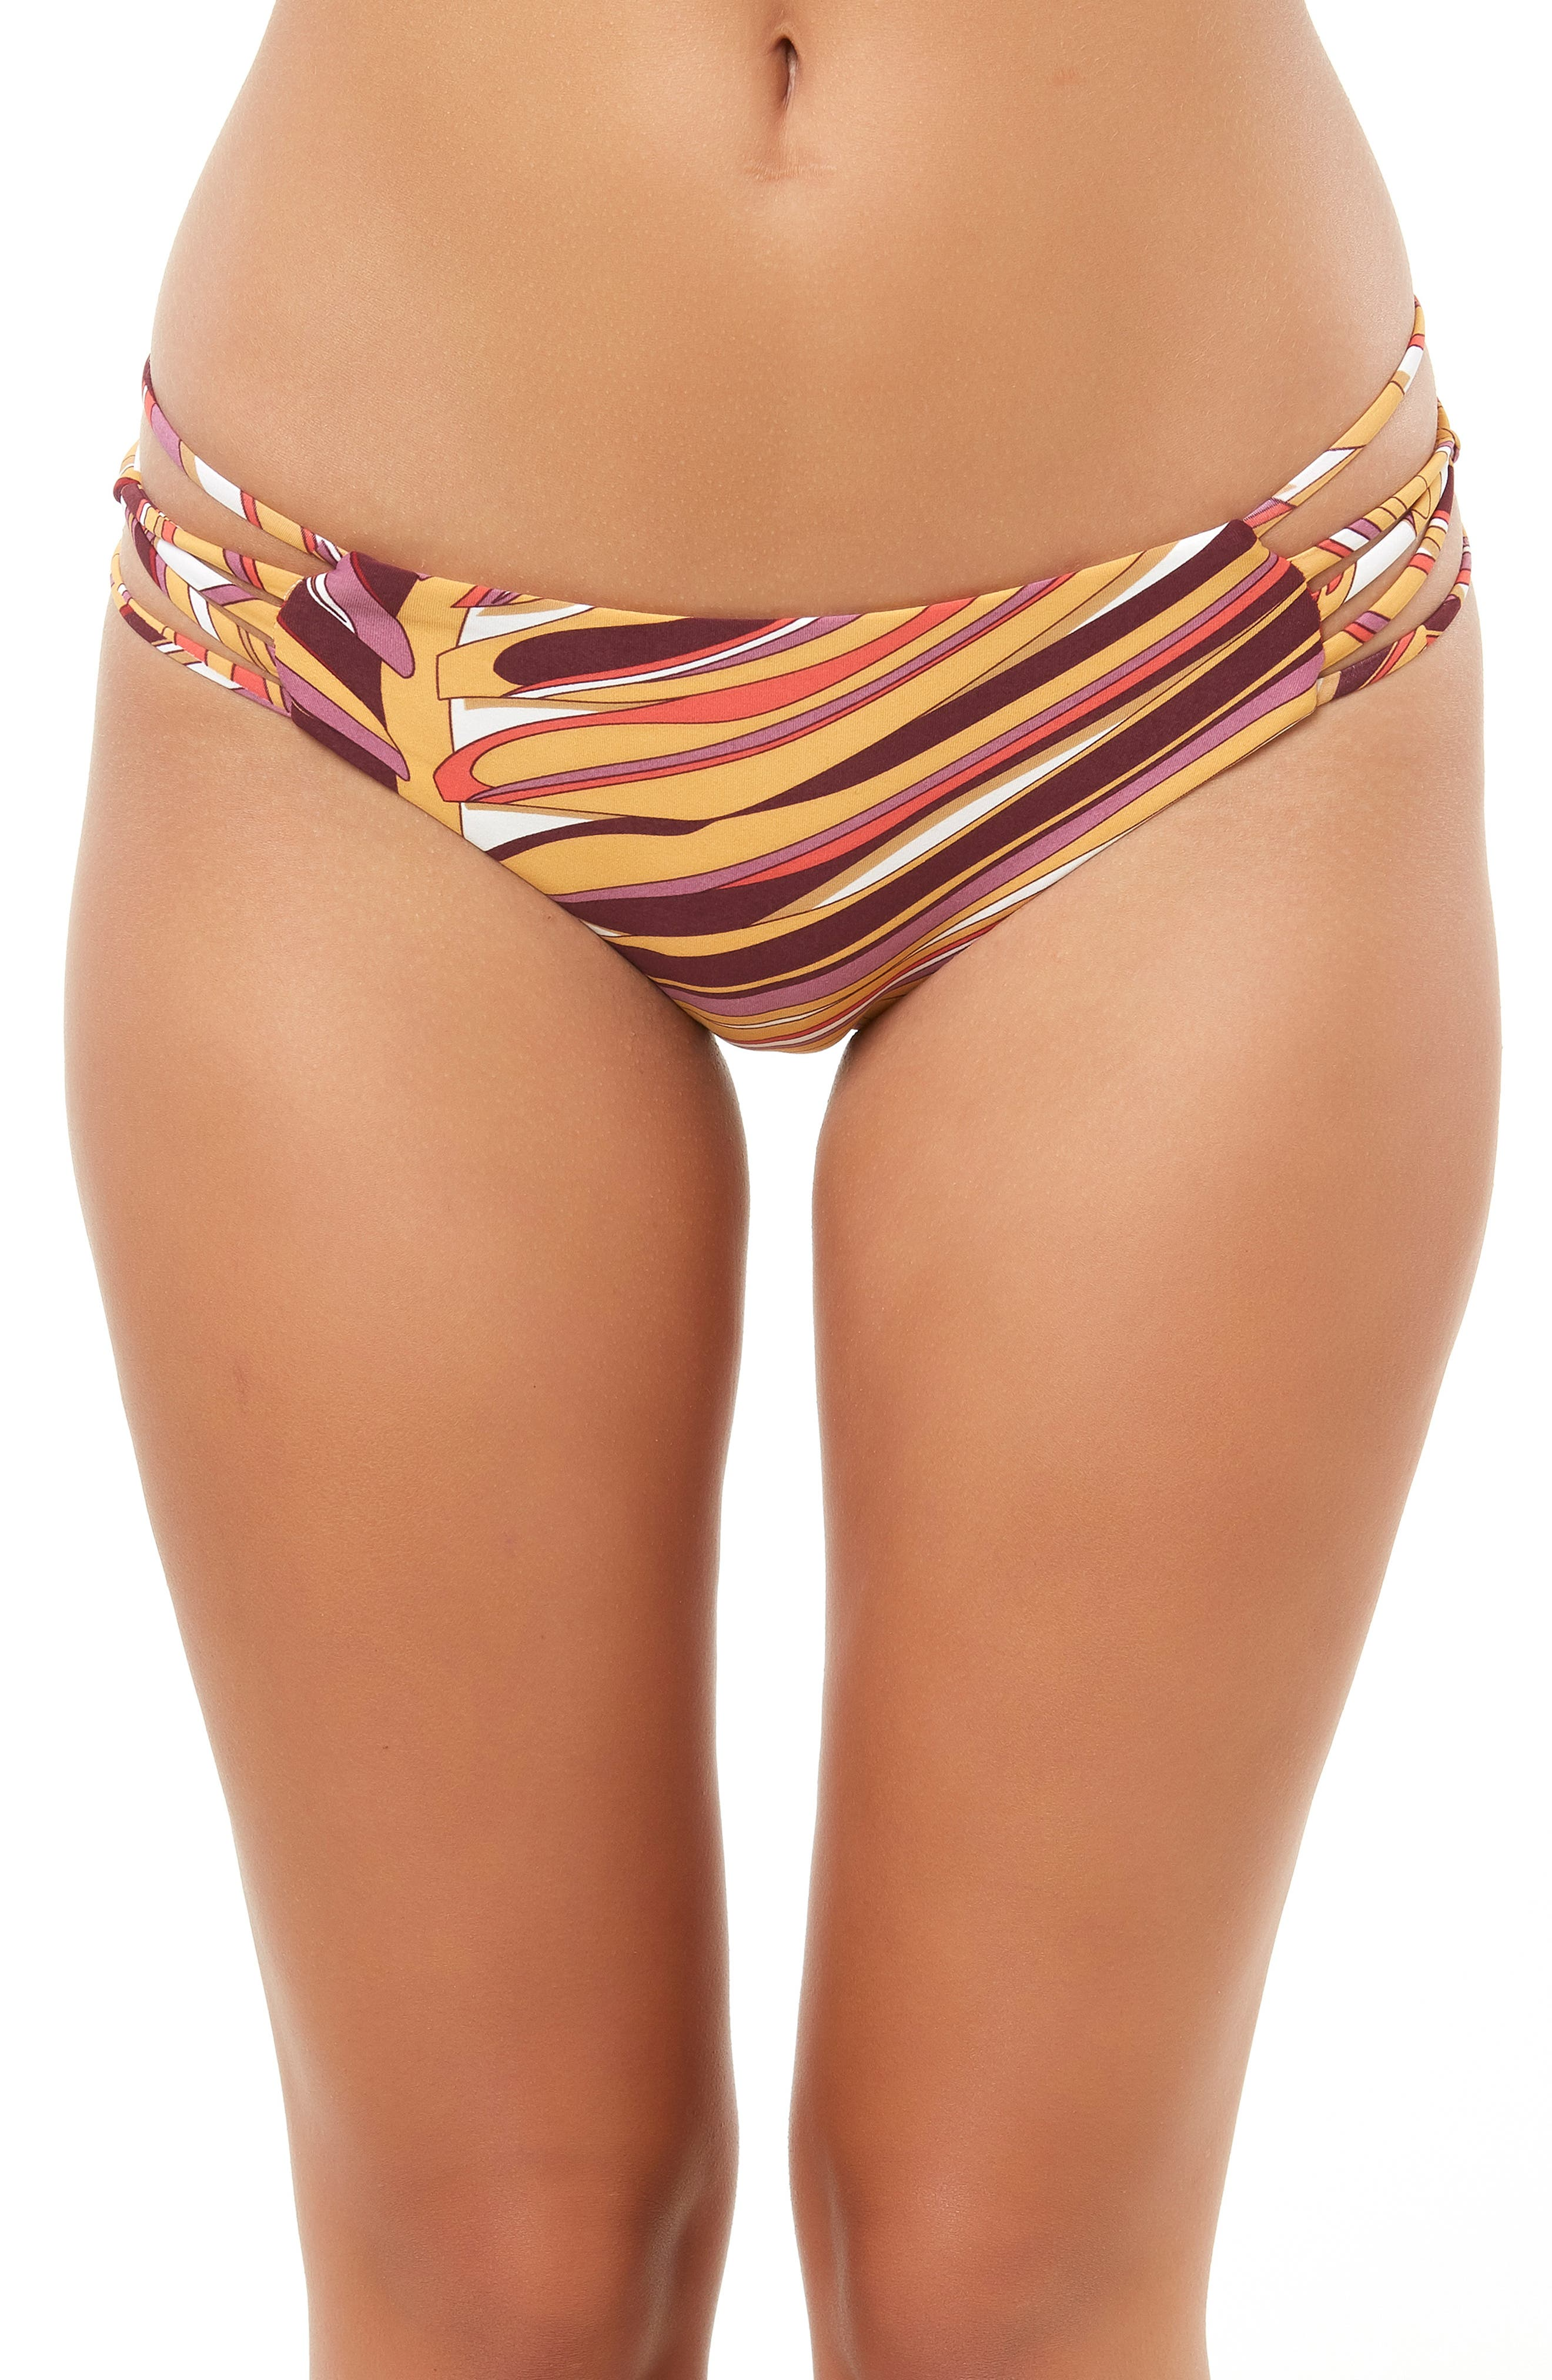 Anacapa Strappy Hipster Bikini Bottoms,                             Alternate thumbnail 3, color,                             PURPLE MAUVE